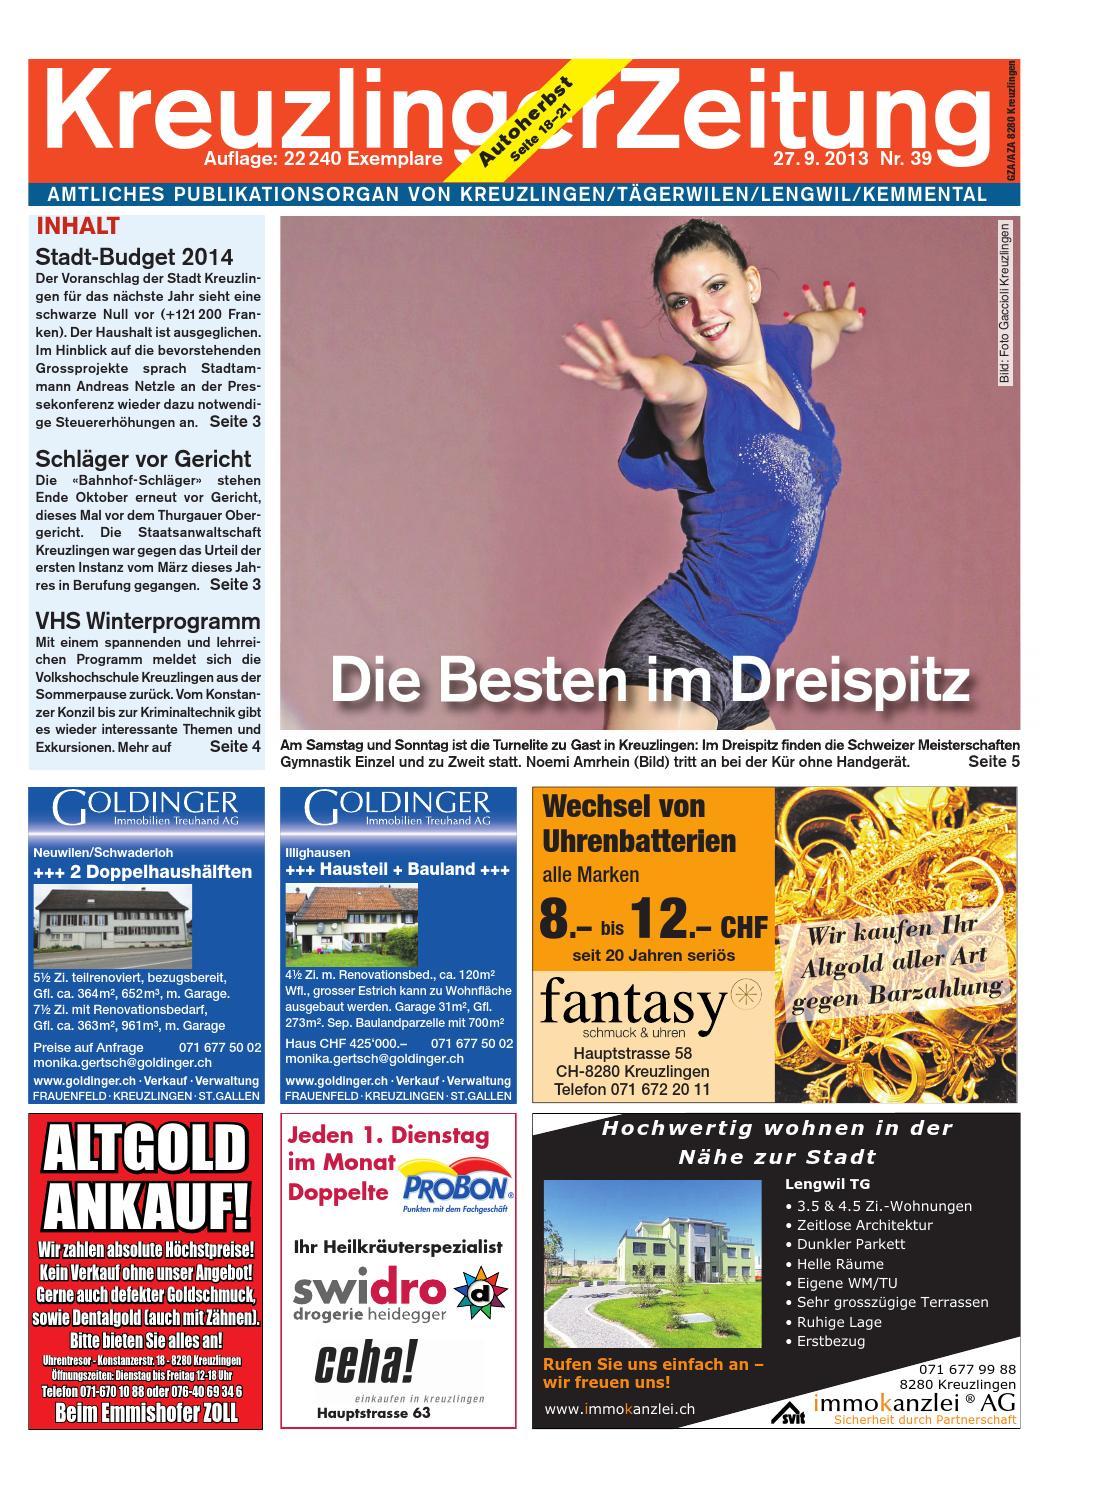 Klz 39 by KreuzlingerZeitung - issuu